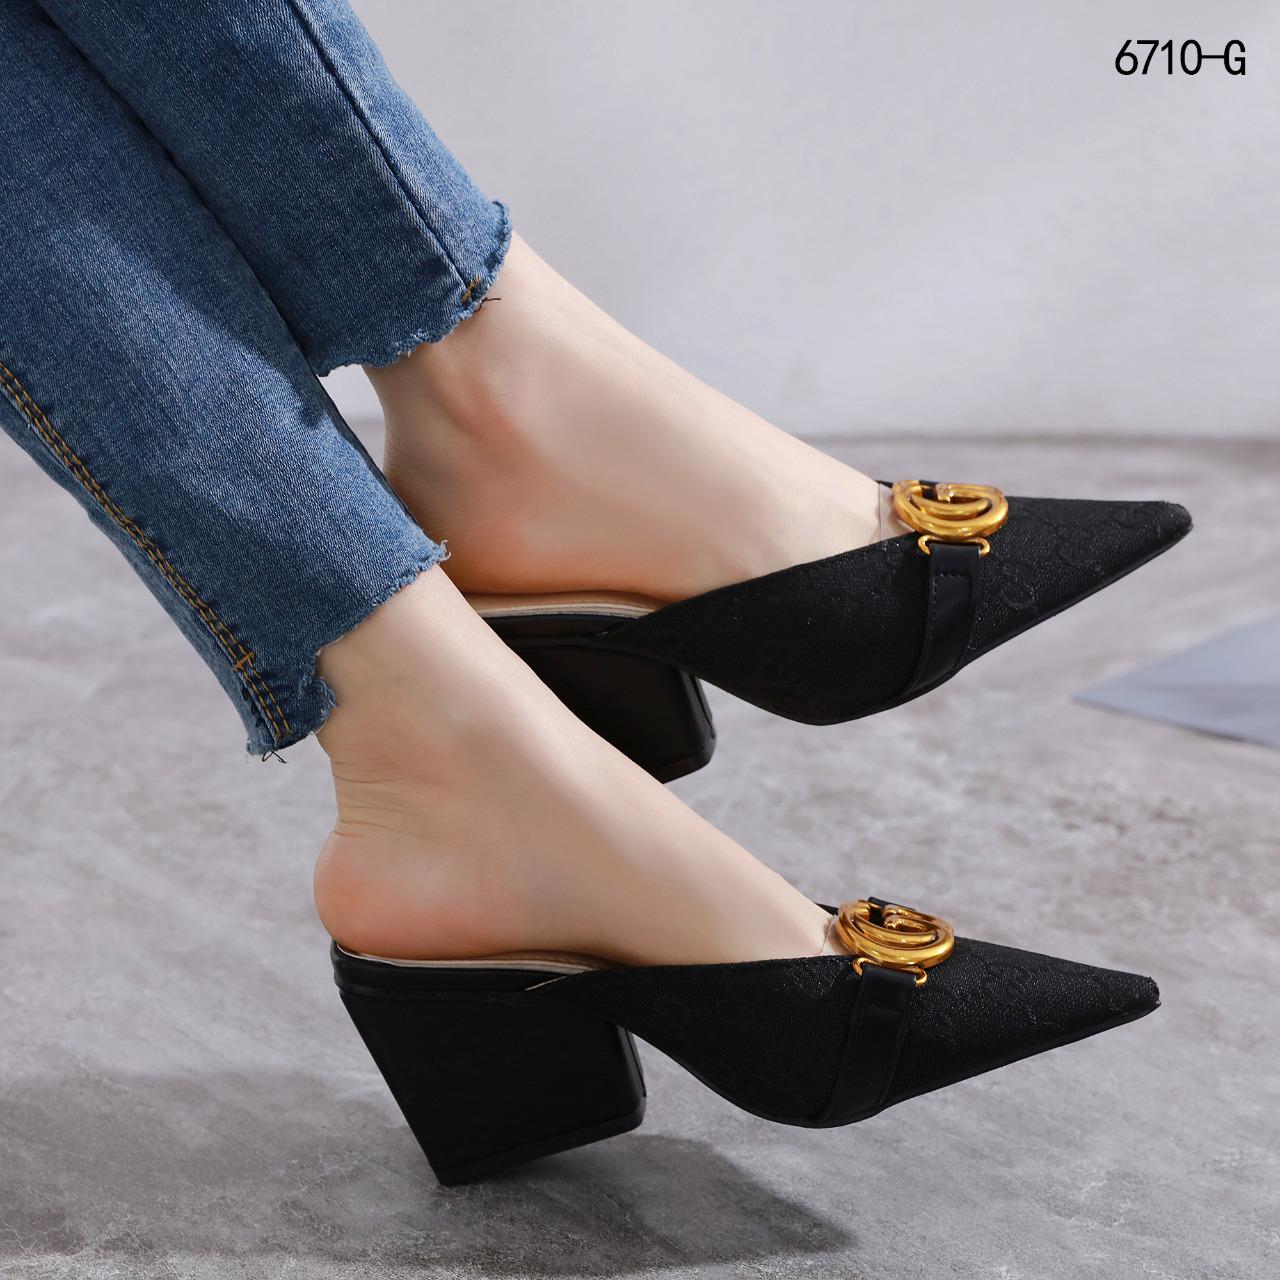 Model sepatu gucci wanita terbaru di jakarta 6710-GH4